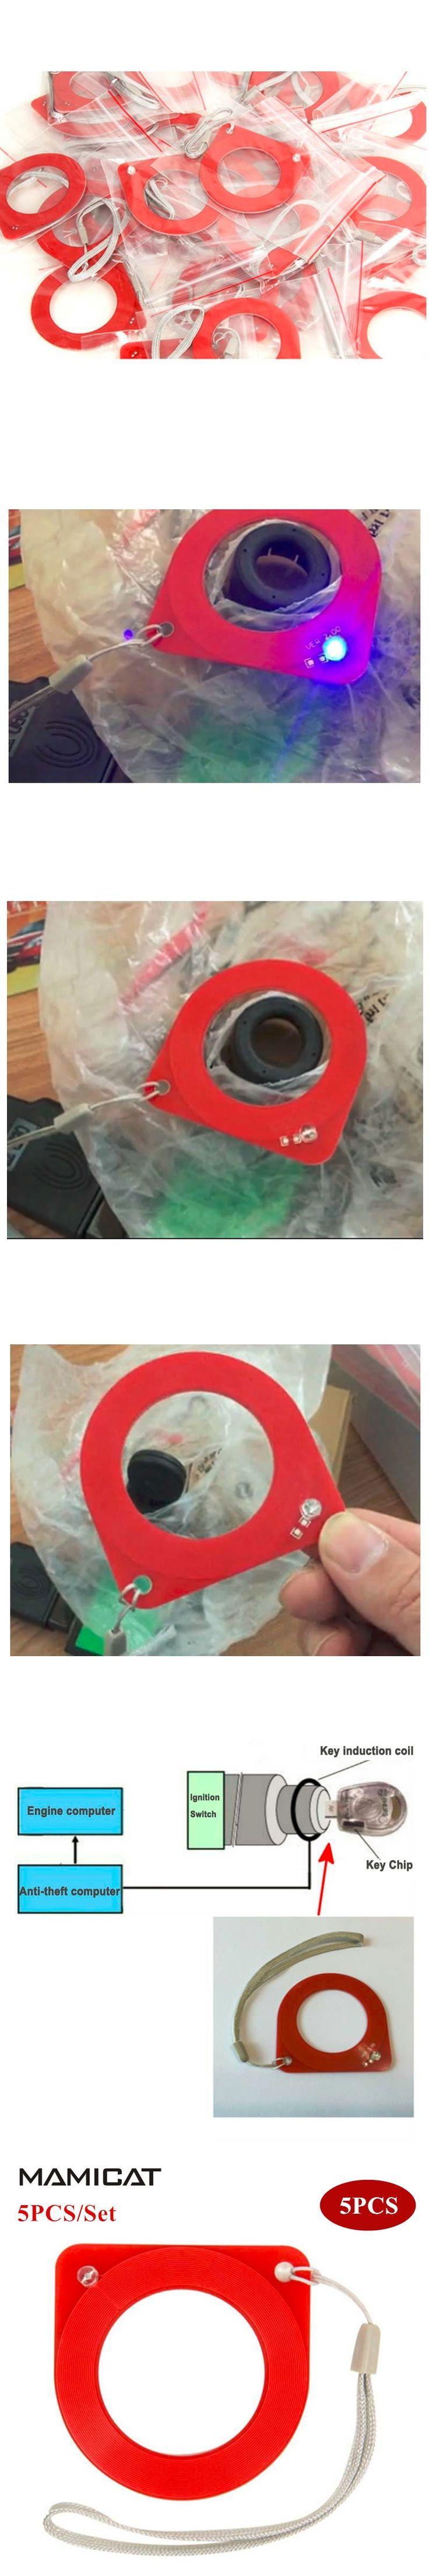 5PCS/SET Car Key ECU Induction Signal Detection Card Auto ECU Test Coil Card Car OBD OBD2 Diagnostic Tool Free Shipping